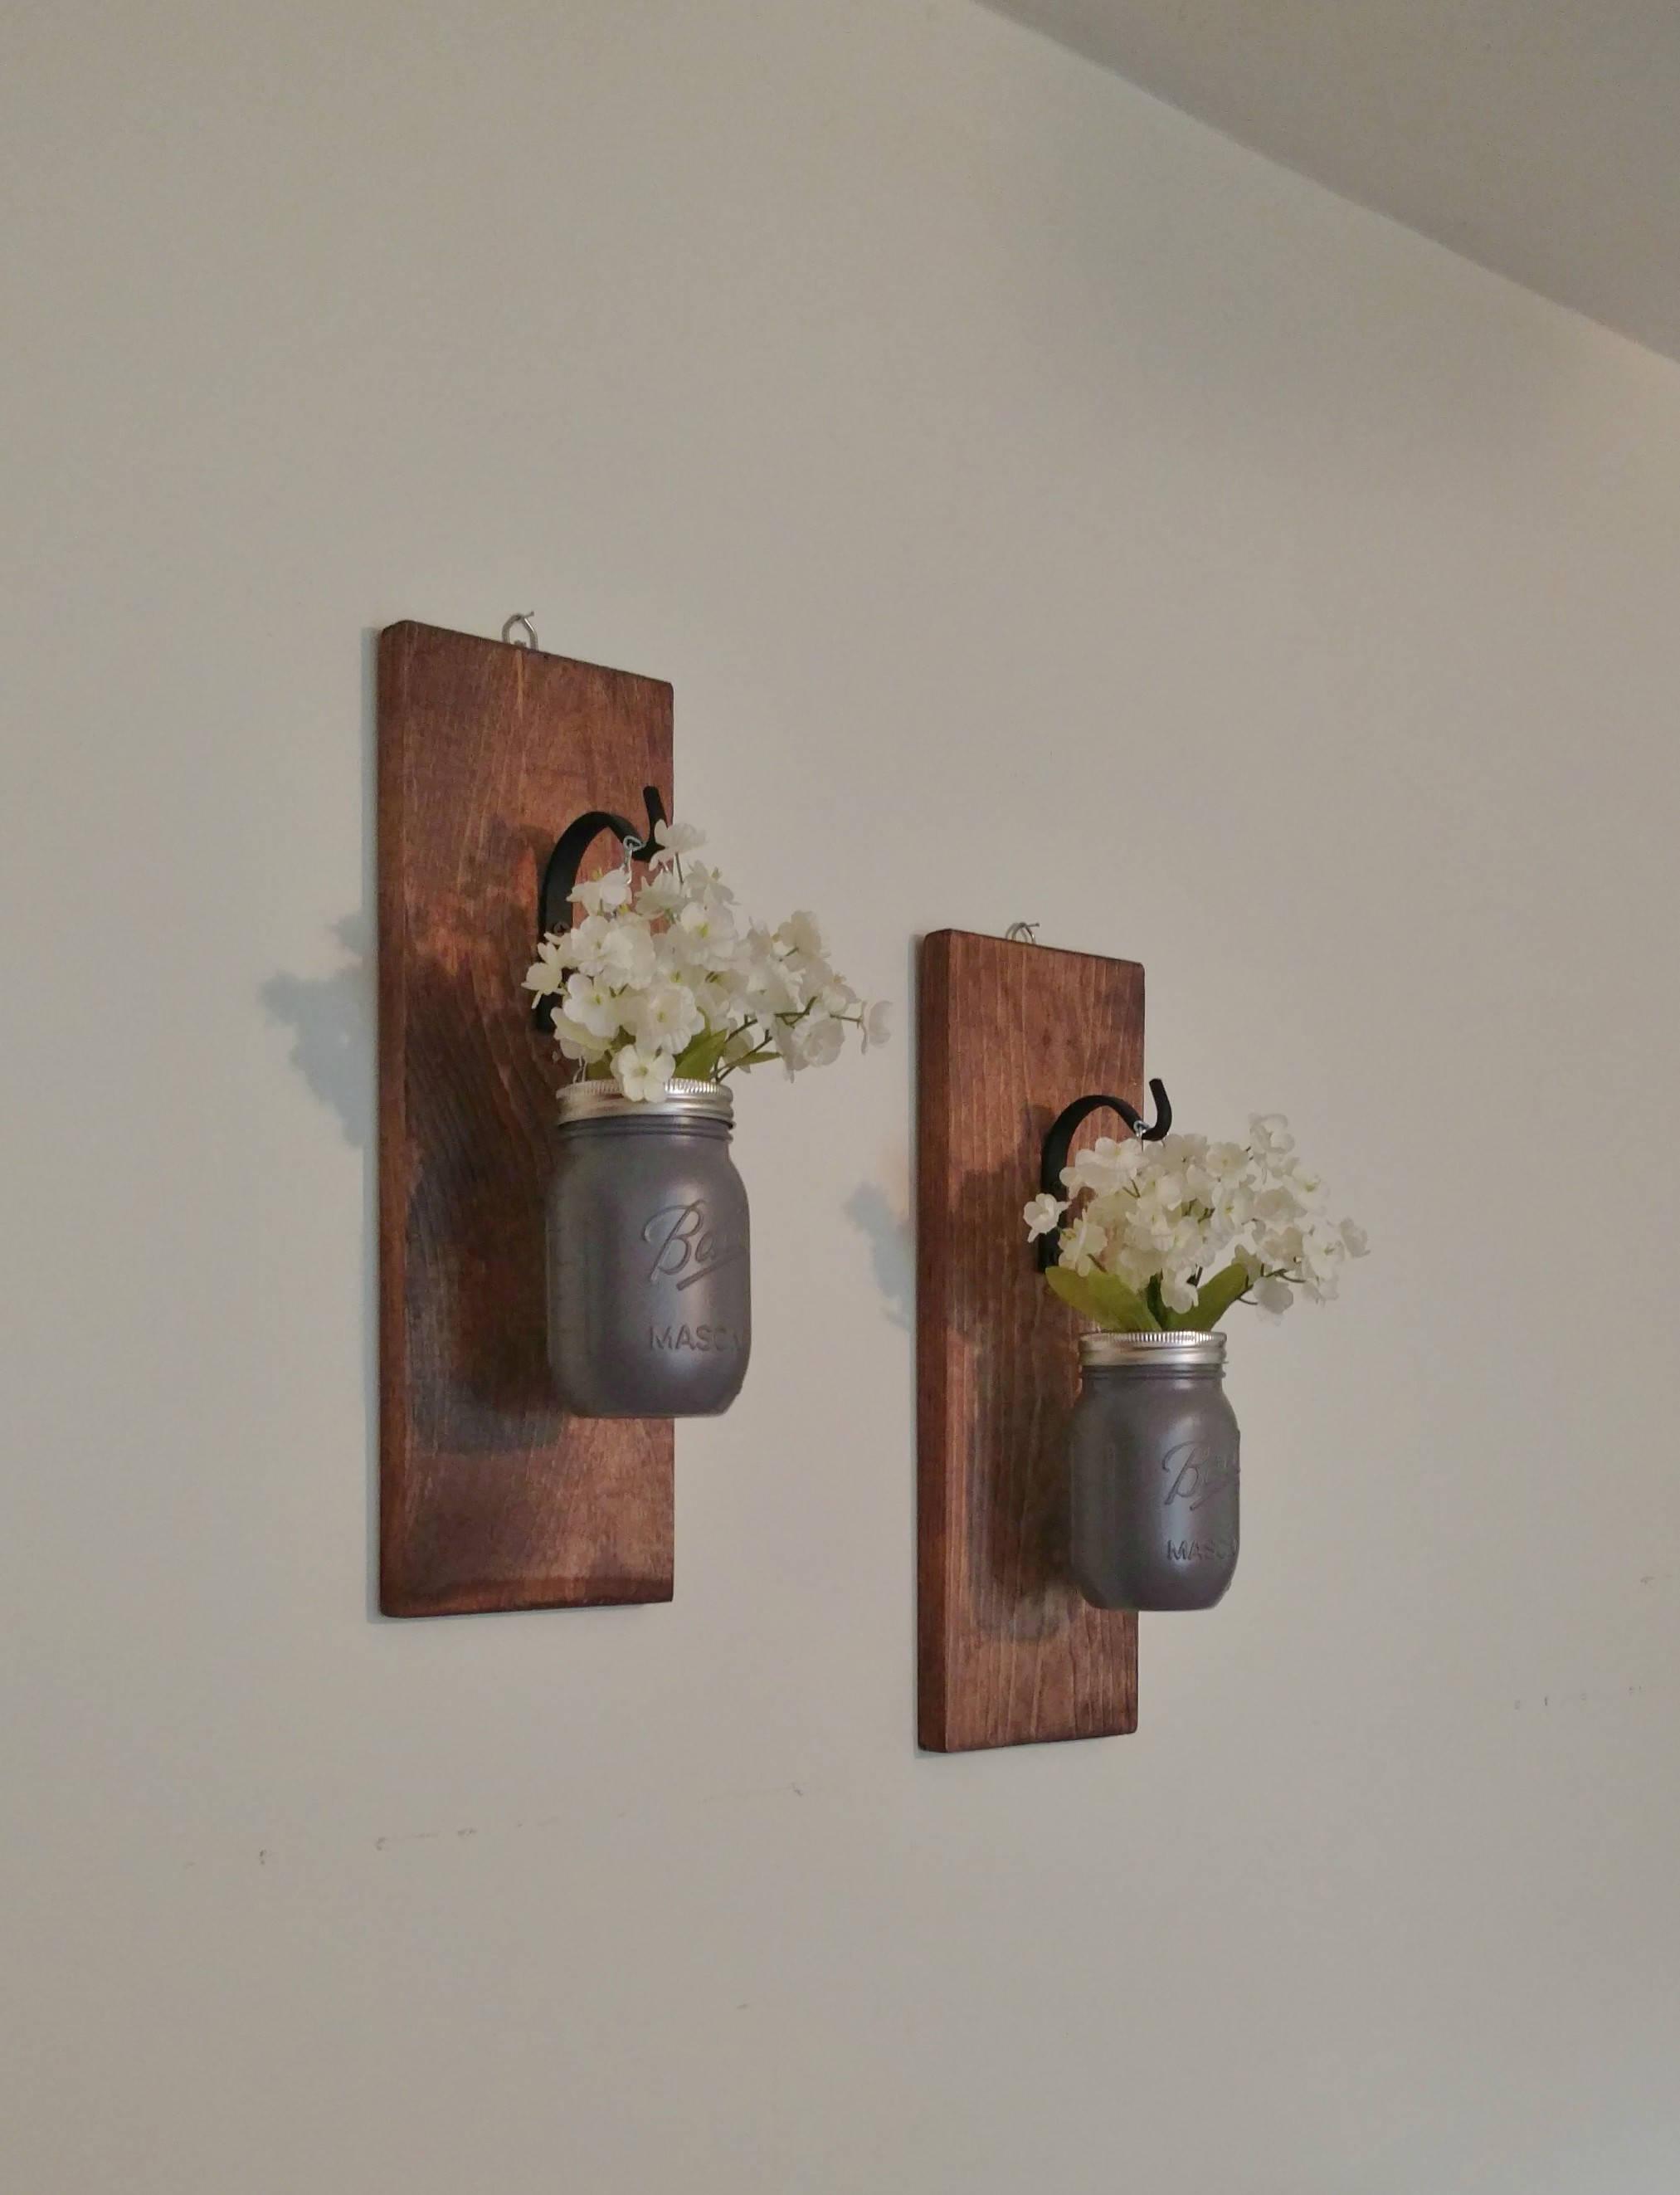 Hanging Masson Jar Wall Sconce Mason Jar Wall Decor Gray Mason Jars